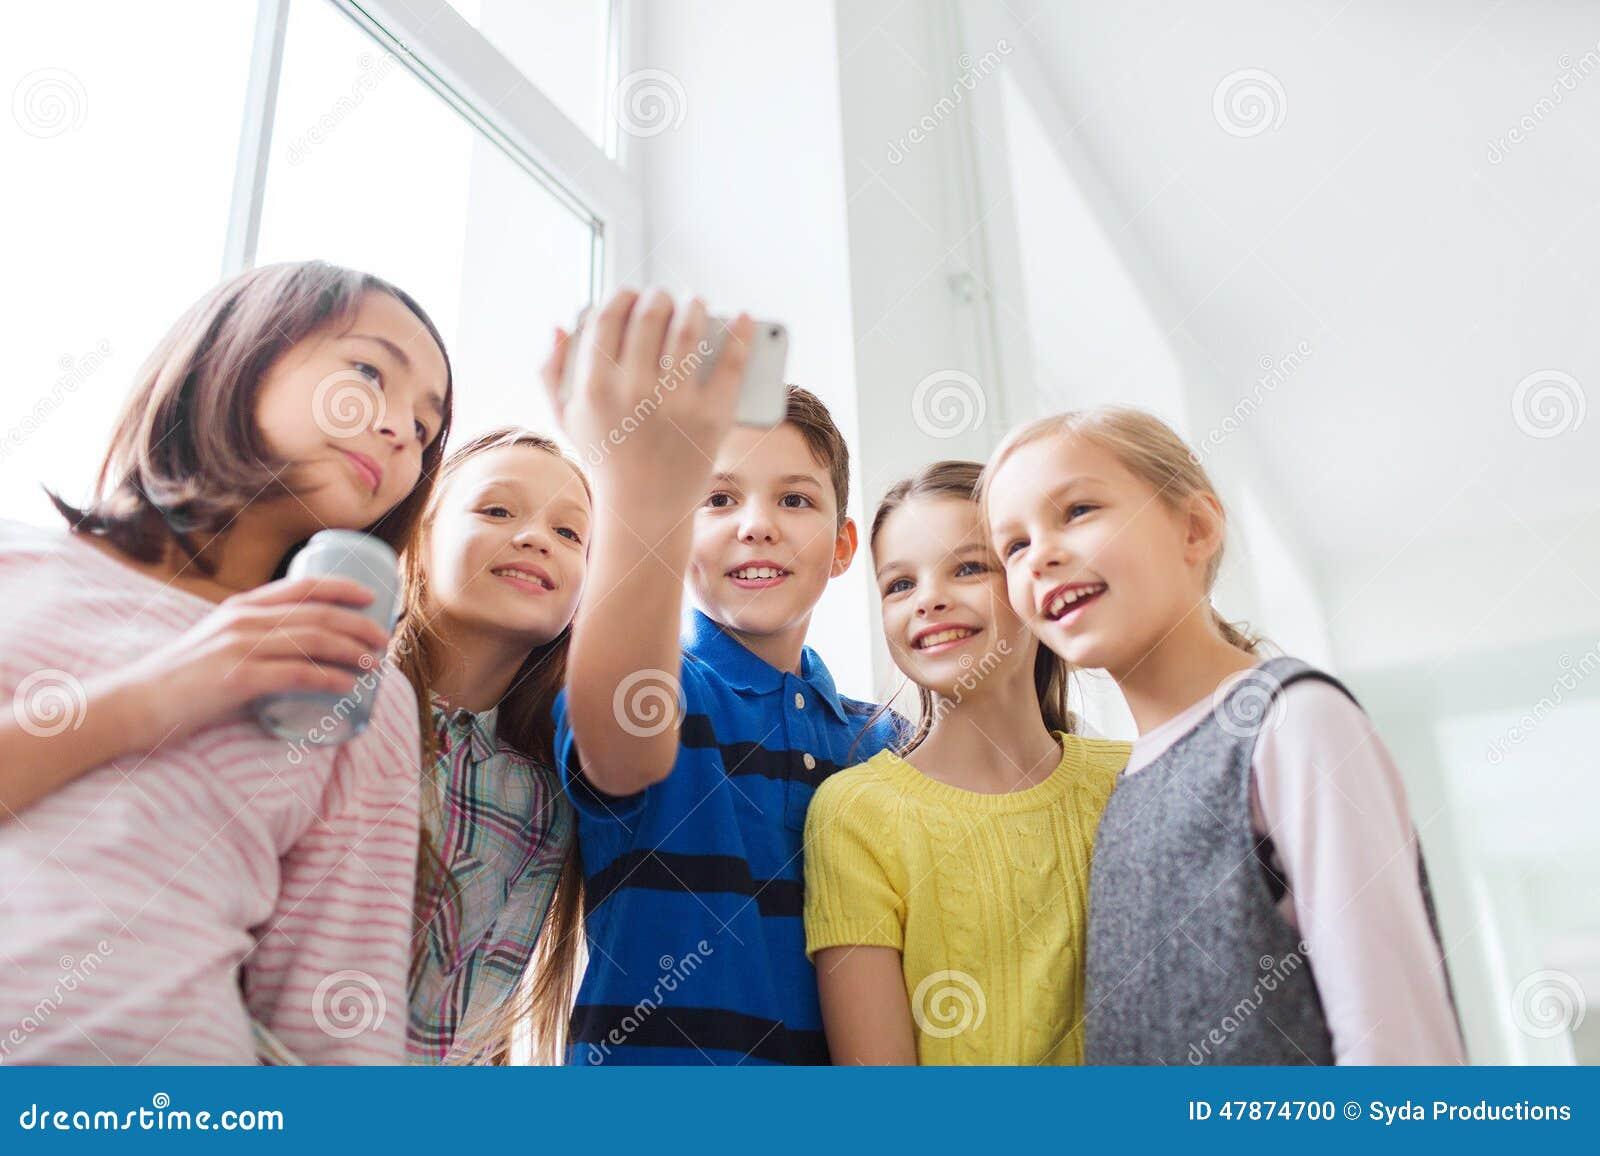 Elementary Group 19